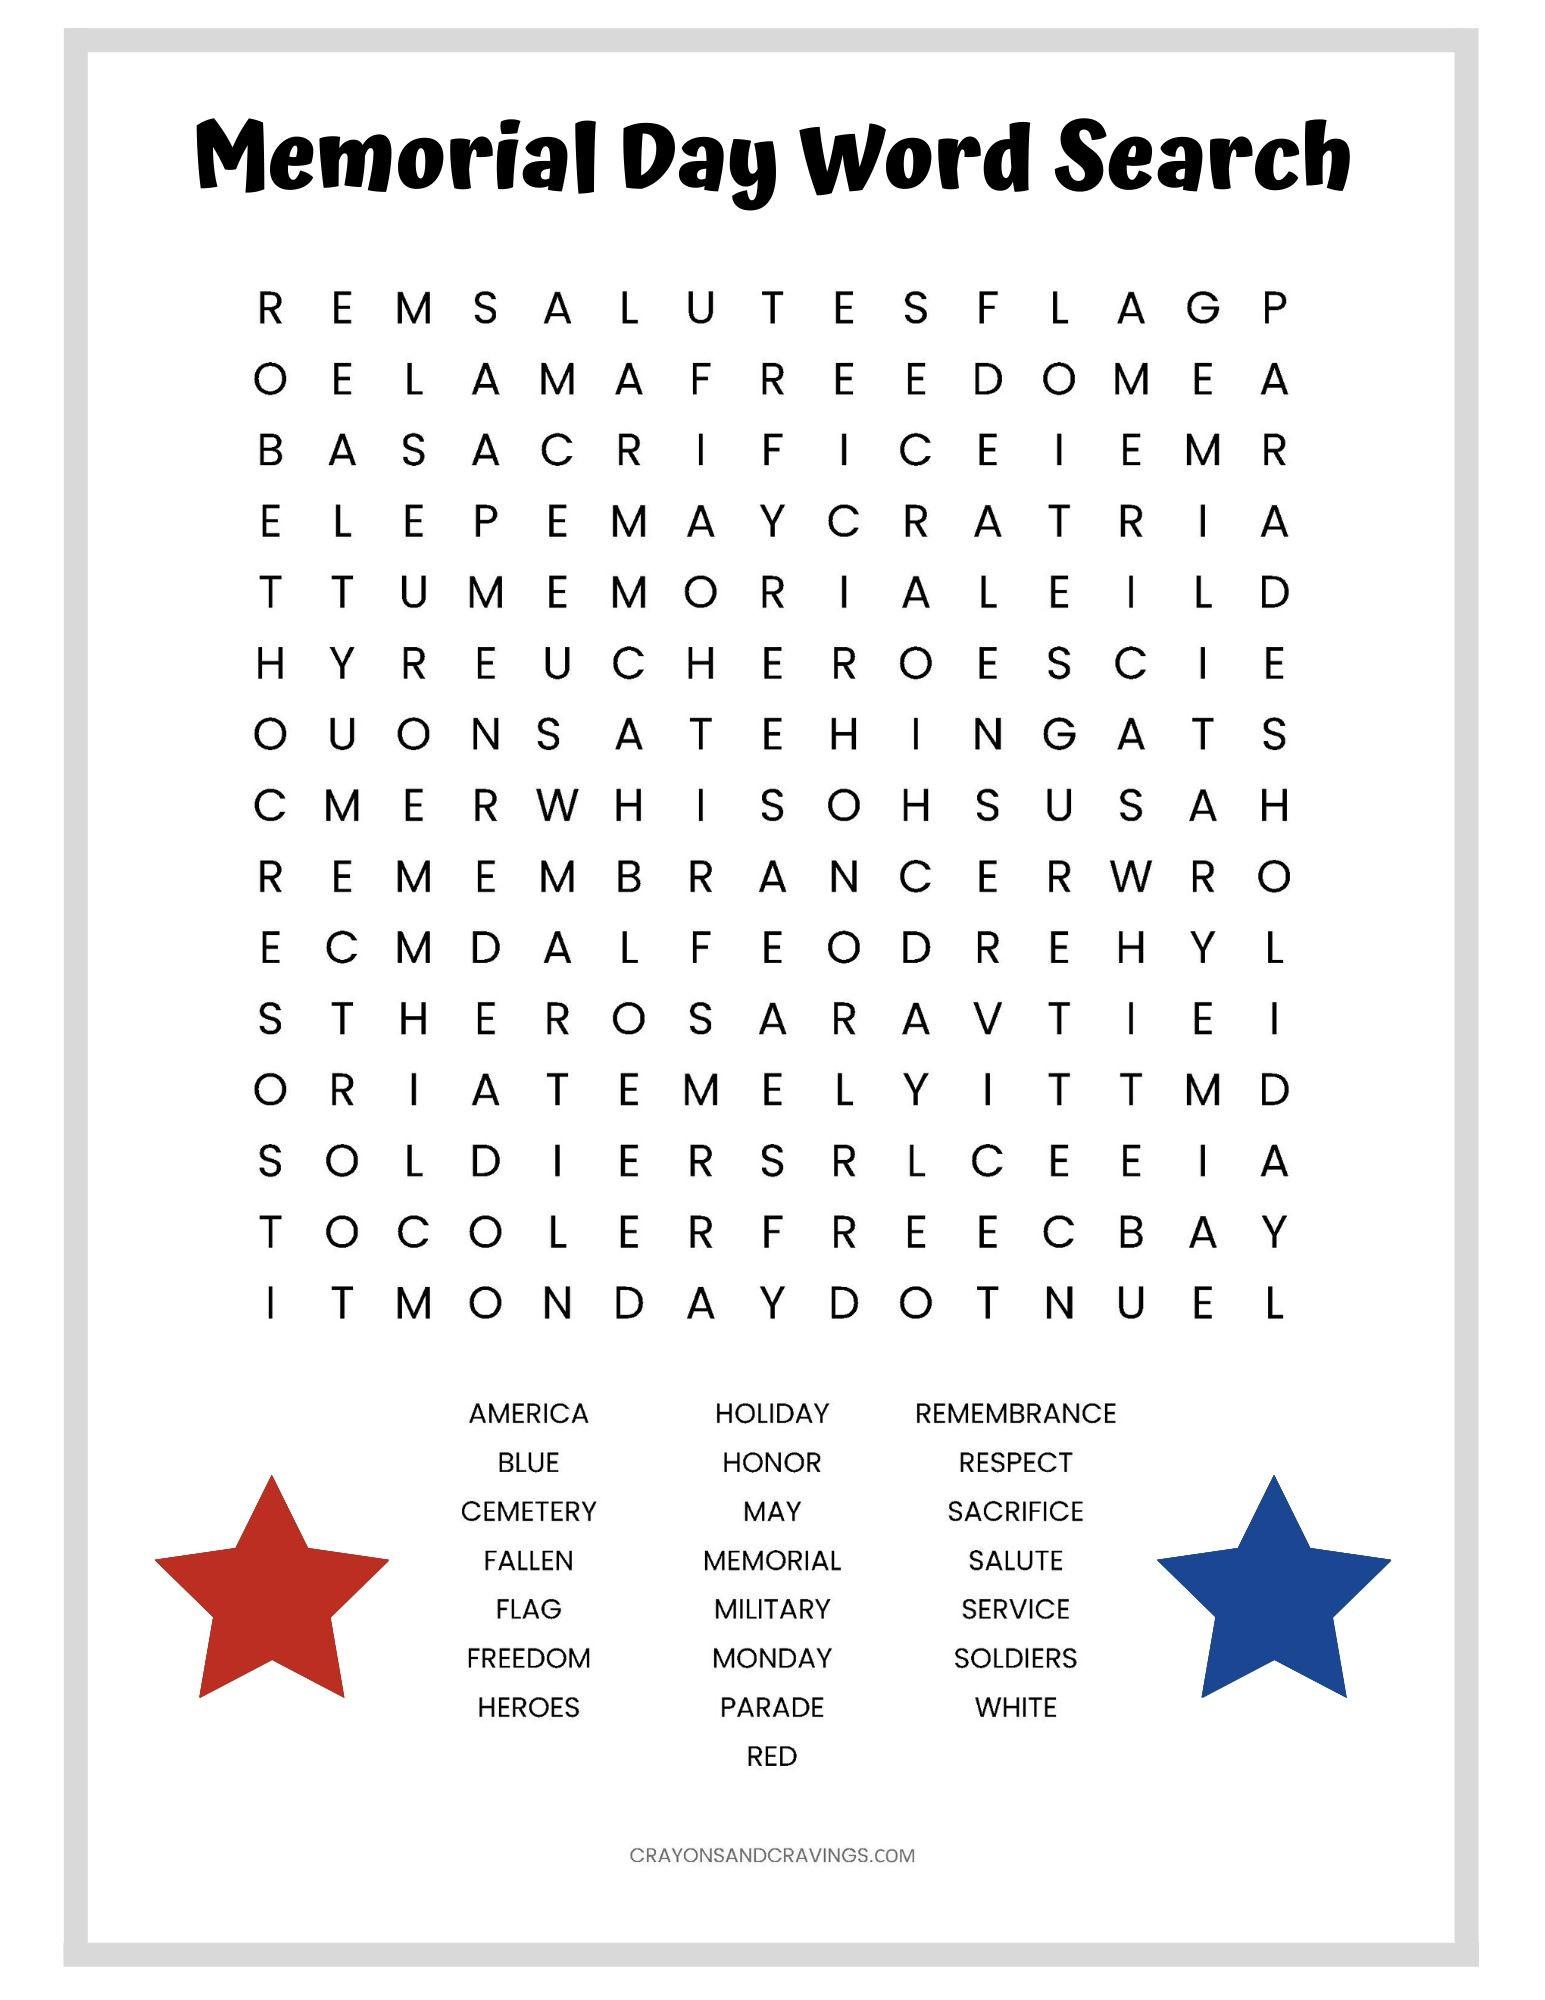 Memorial Day Worksheets Free Printable Memorial Day Word Search Free Printable Worksheet